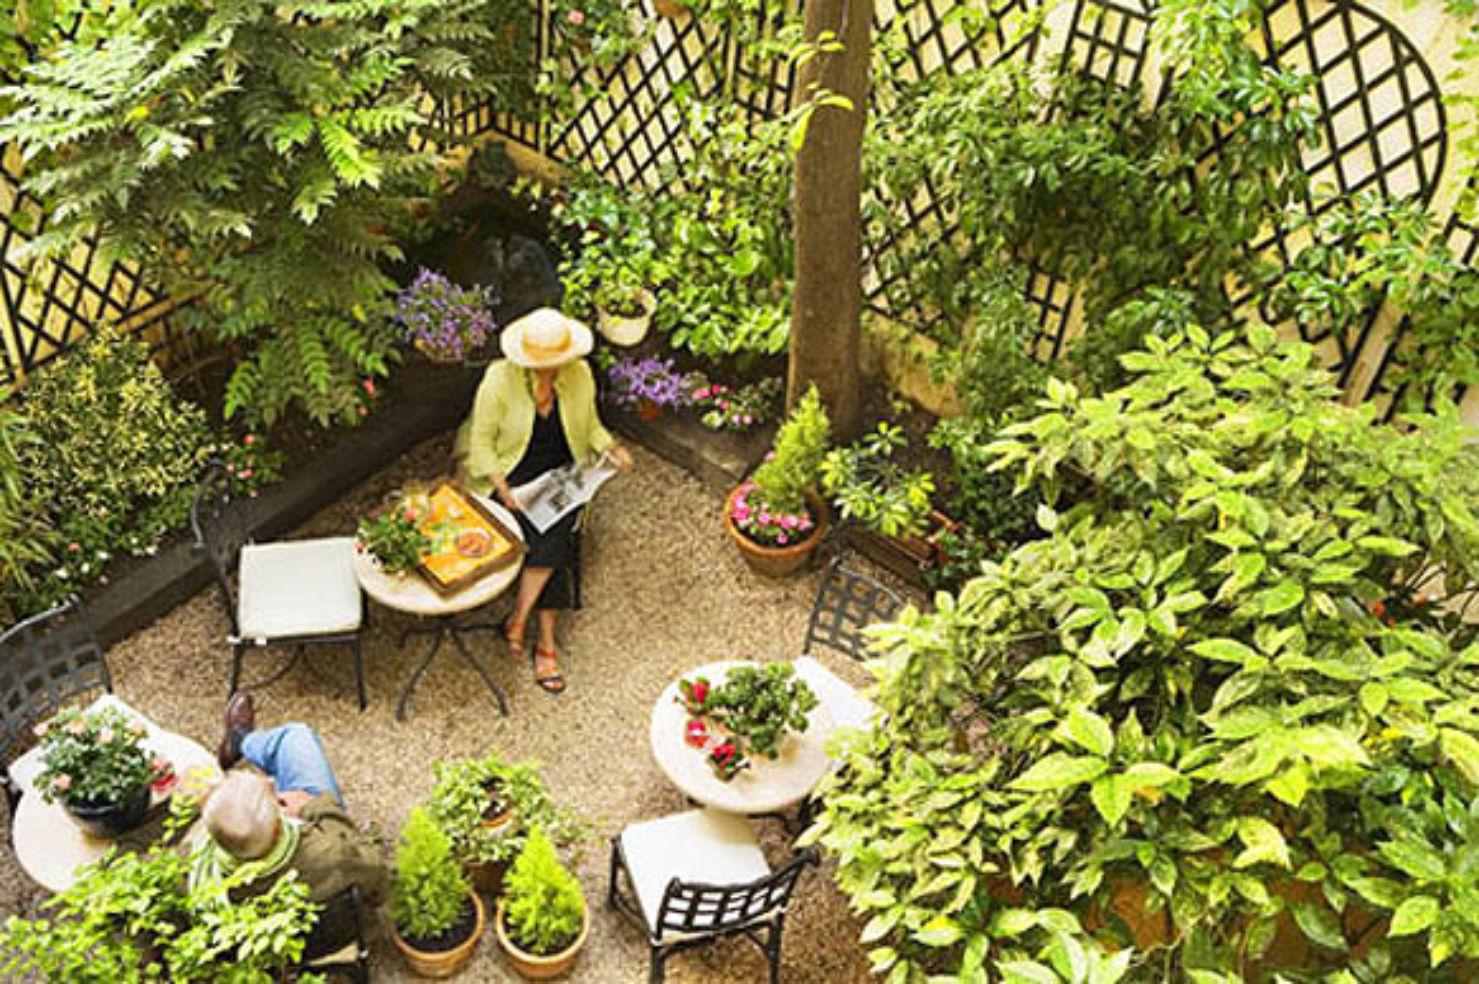 Hotel d'Albion's garden